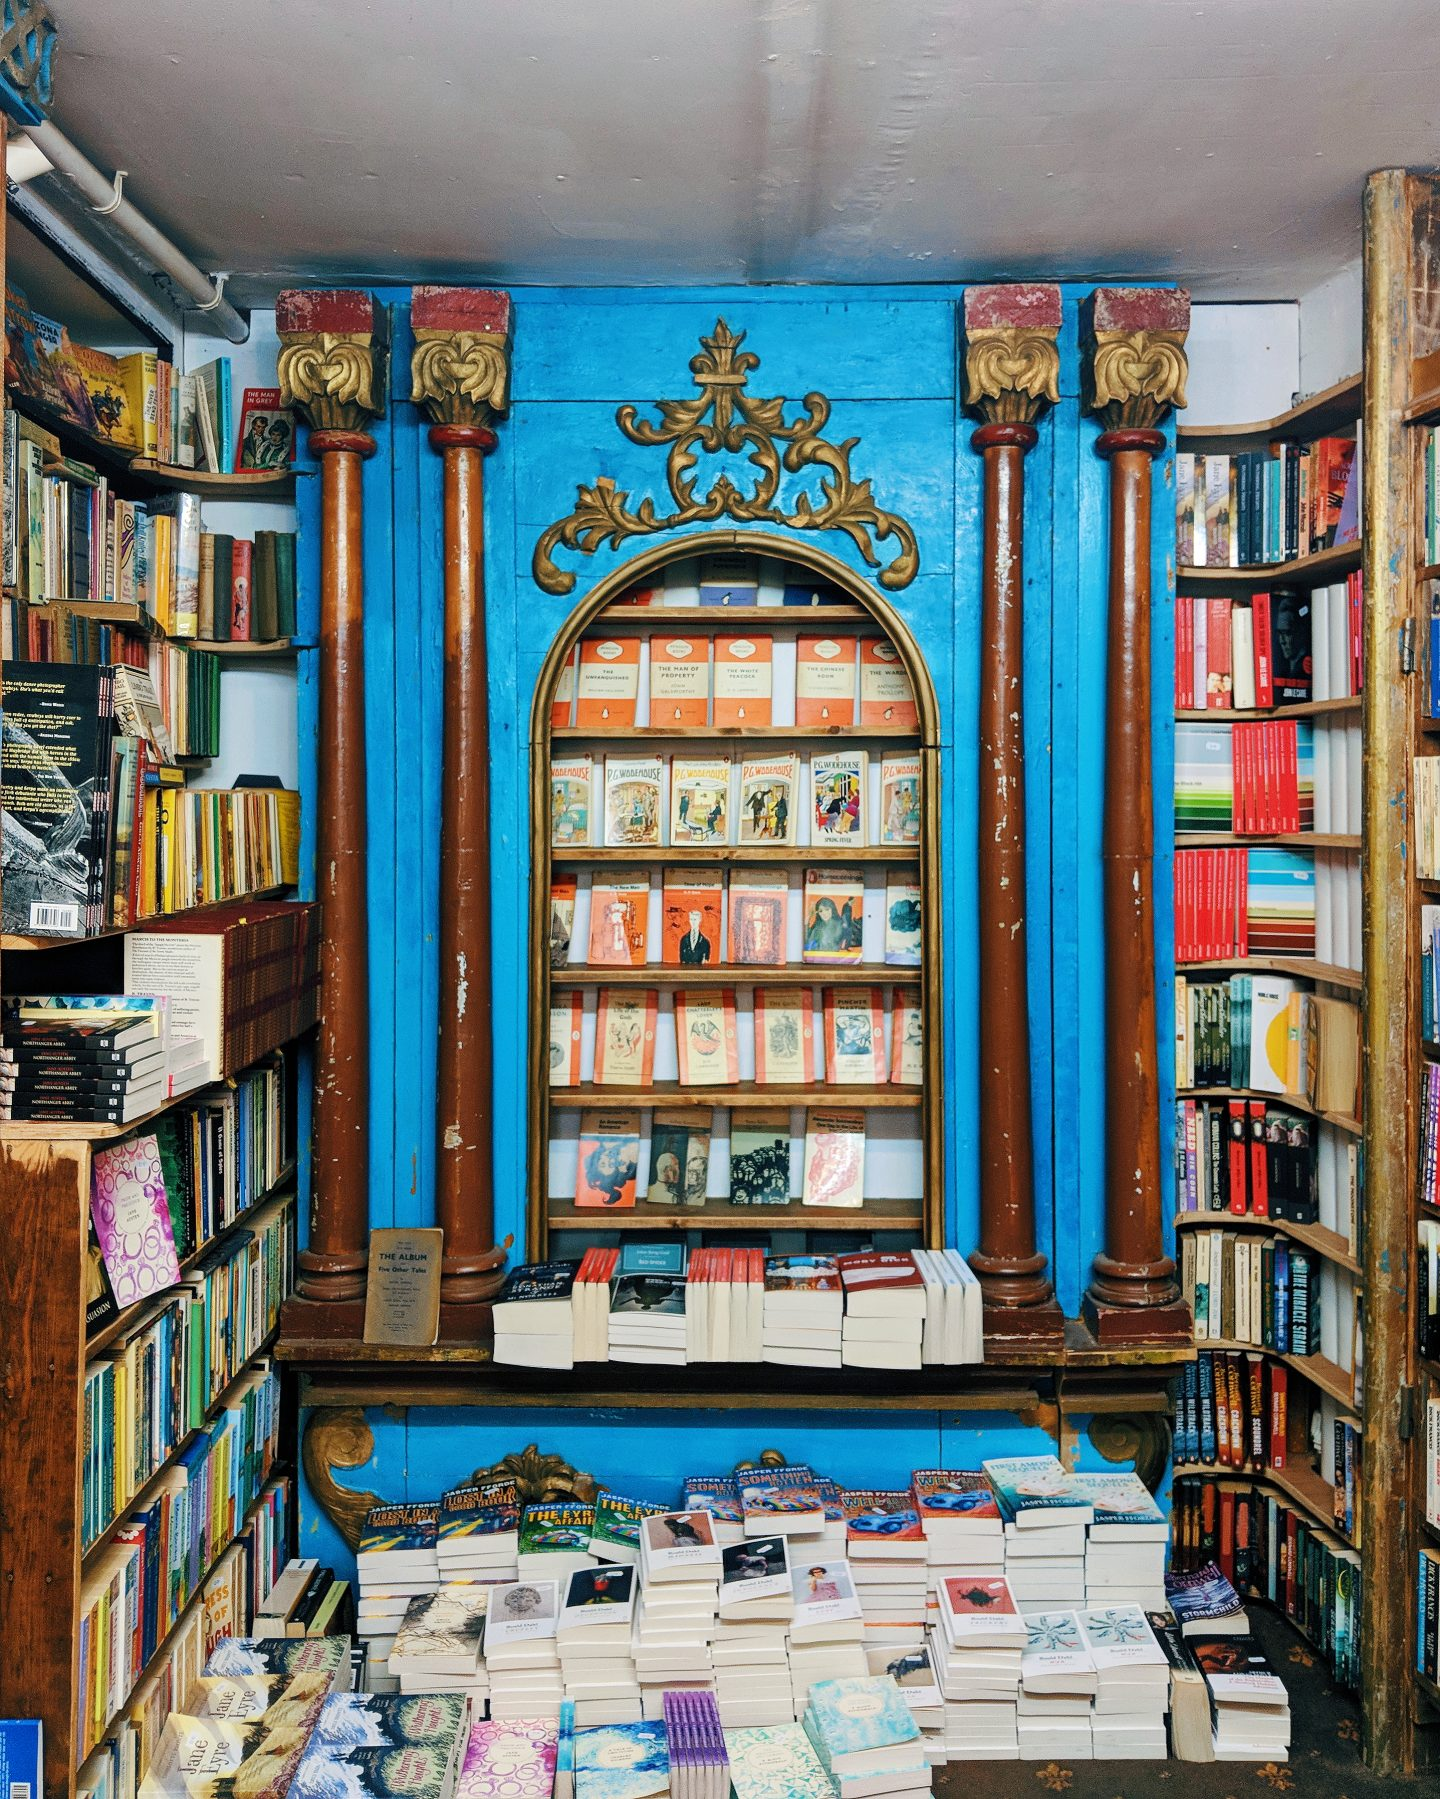 The Vintage Penguin bookshelves at Addyman Books